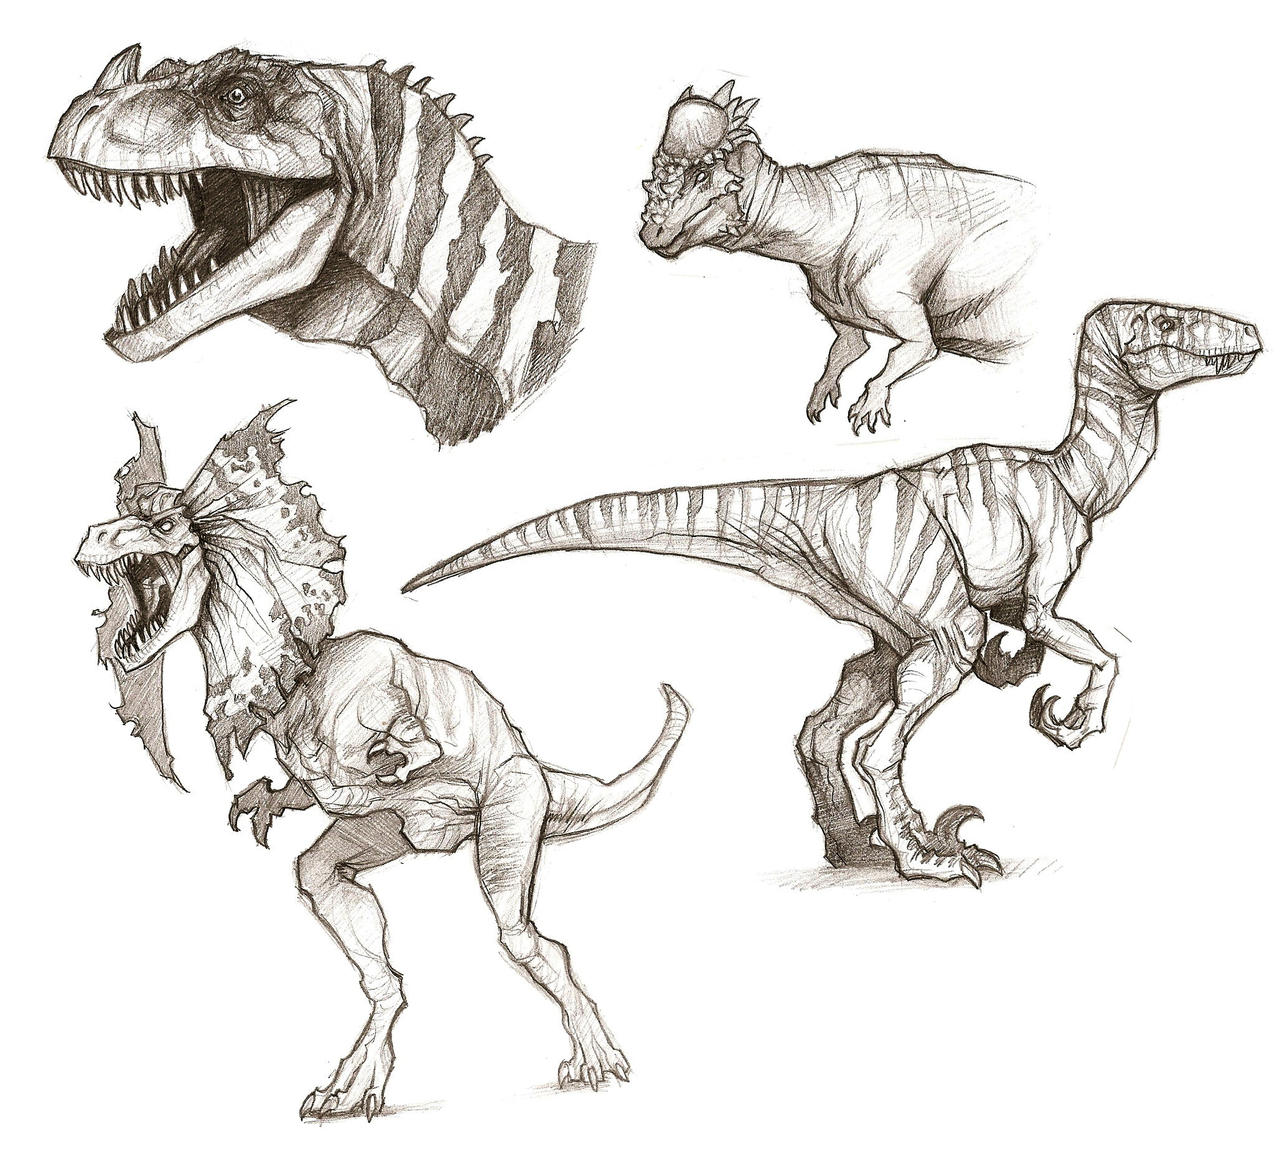 Uncategorized Sketches Of Dinosaurs dino sketches by notesz on deviantart notesz